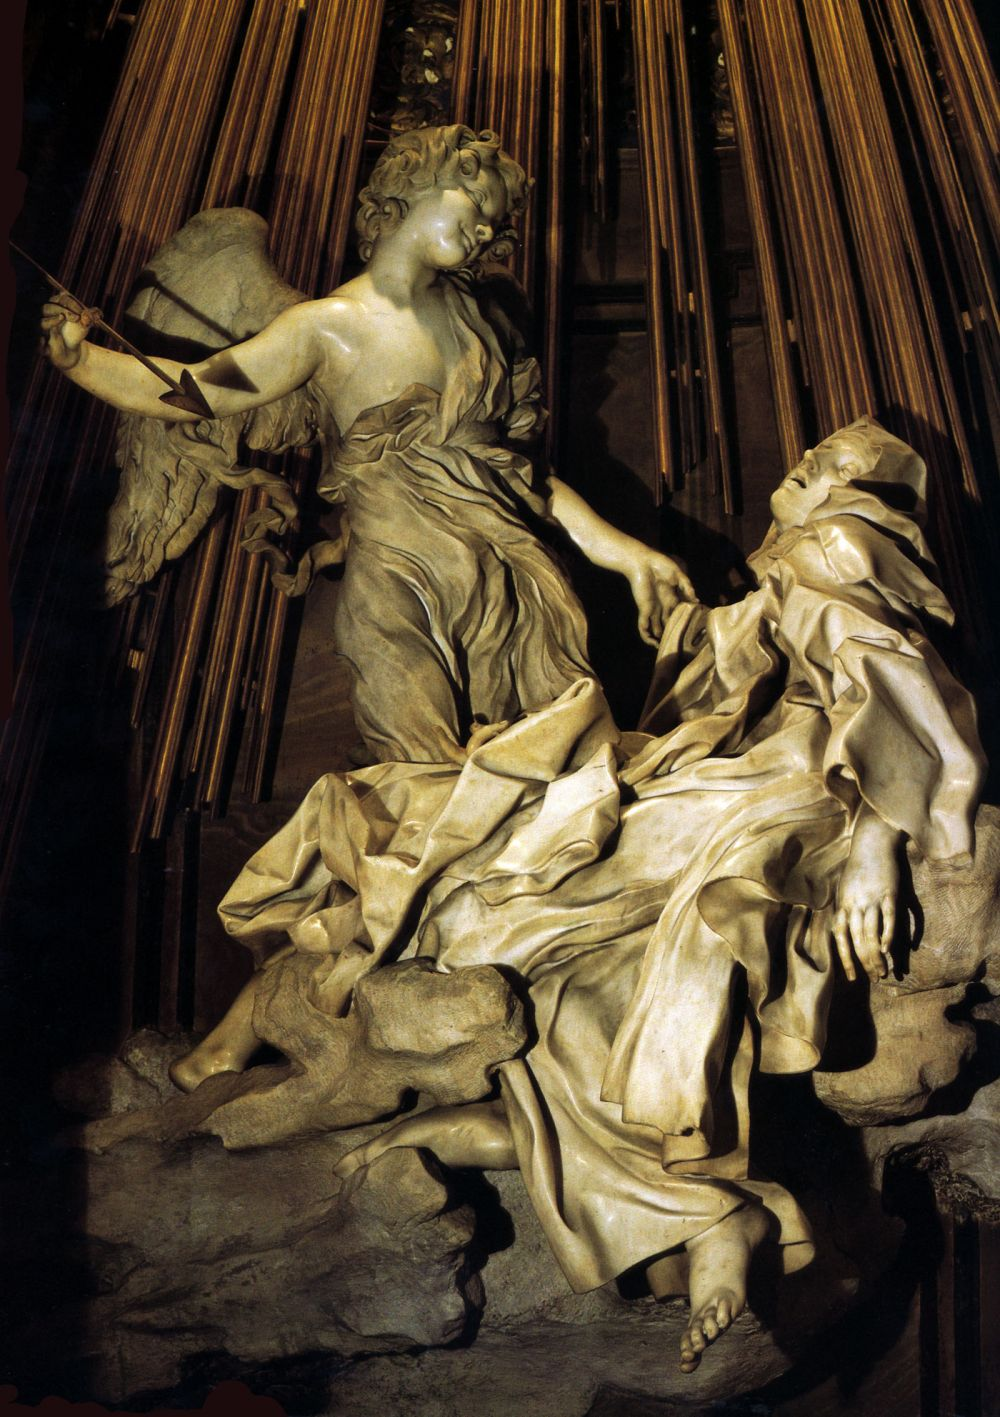 Mujeres. Mitologías Lorenzo Bernini,Êxtase de Santa Teresa, 1645-1652.